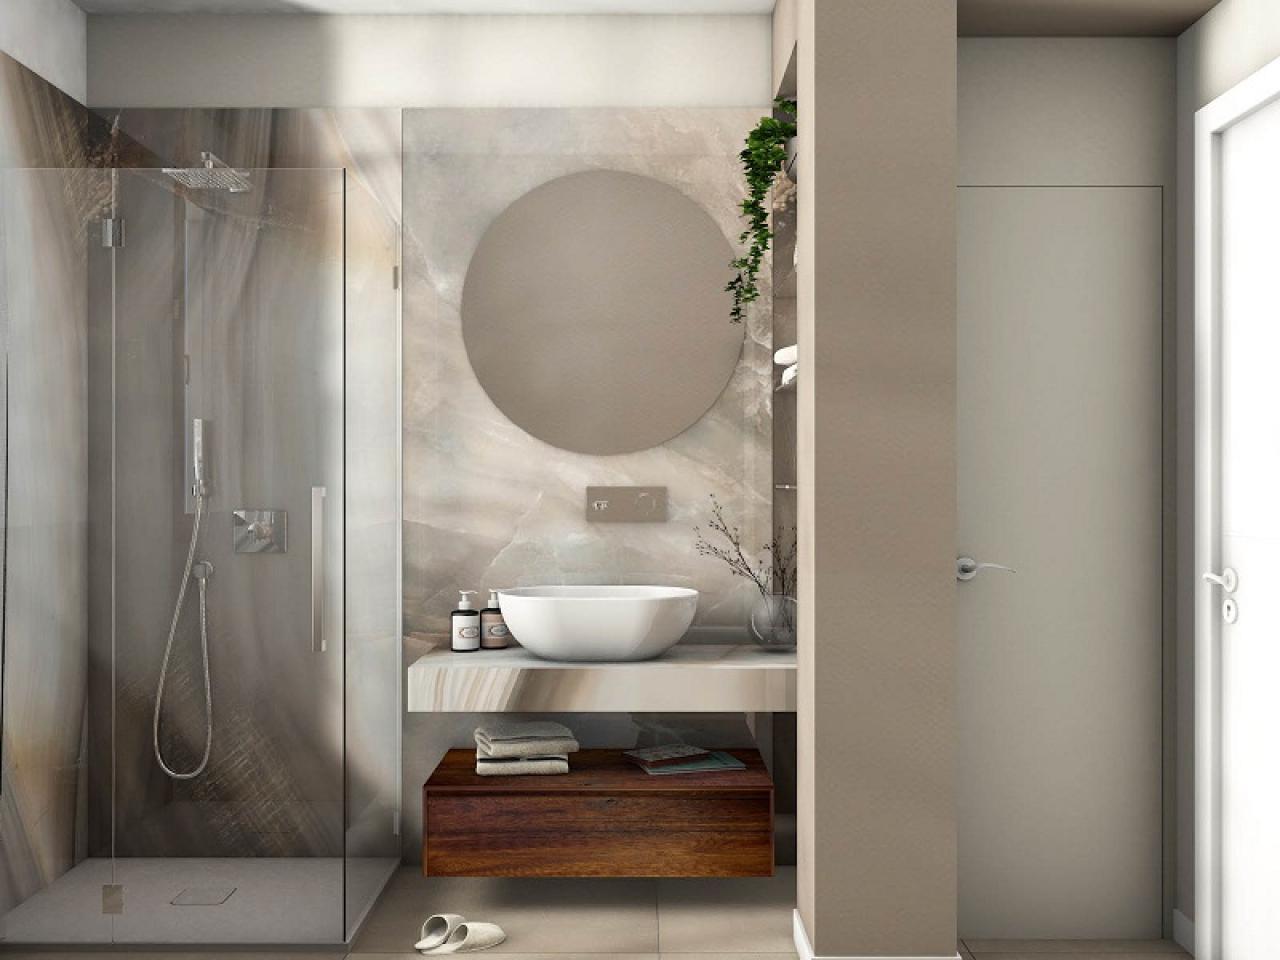 Bagni moderni: progetti di Annalisa | Fratelli Pellizzari